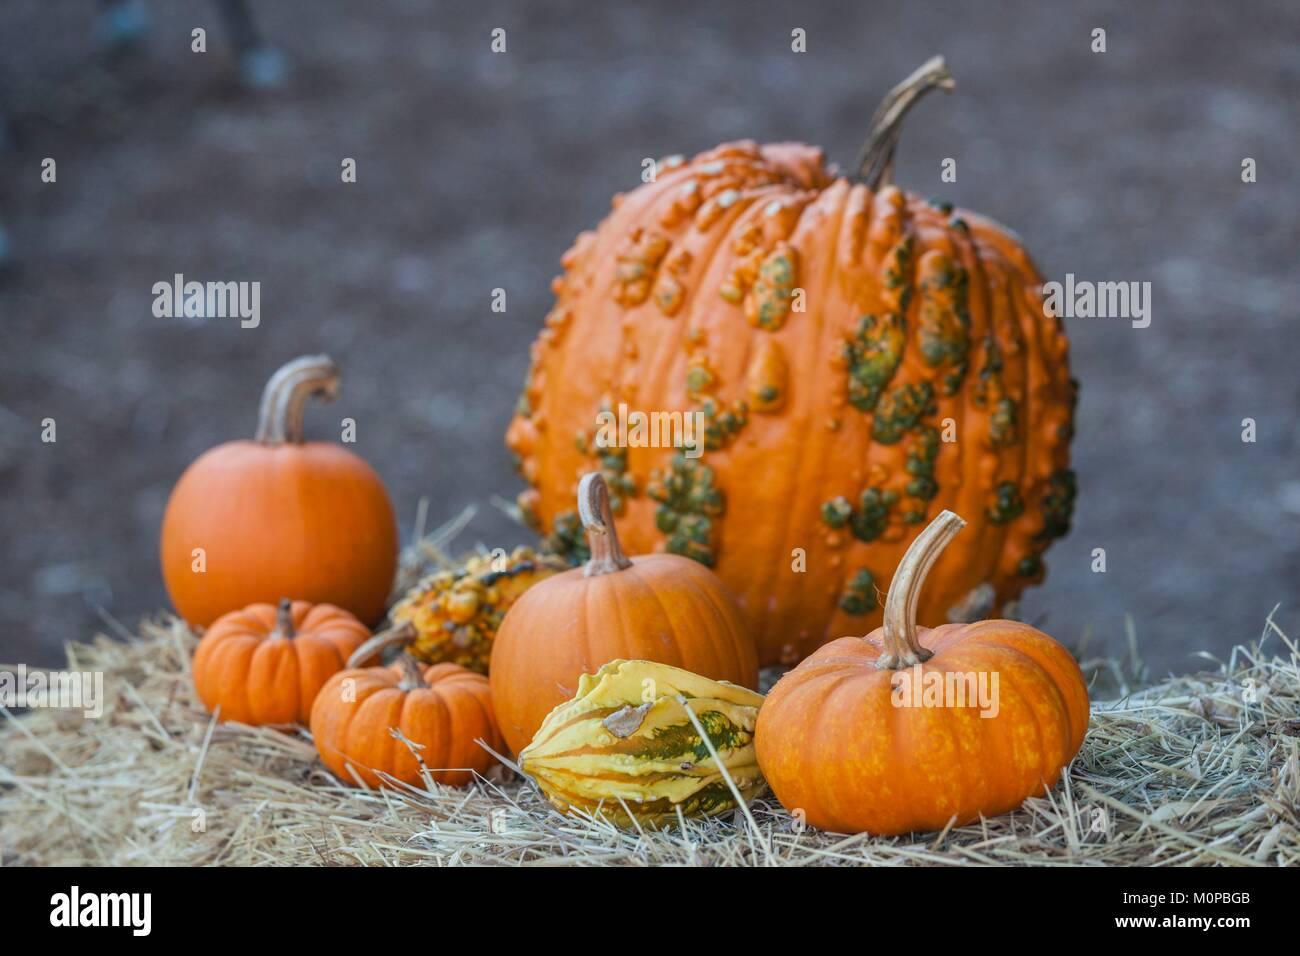 United States,New York,Adirondack Mountains,Bolton Landing,autumn pumpkins - Stock Image